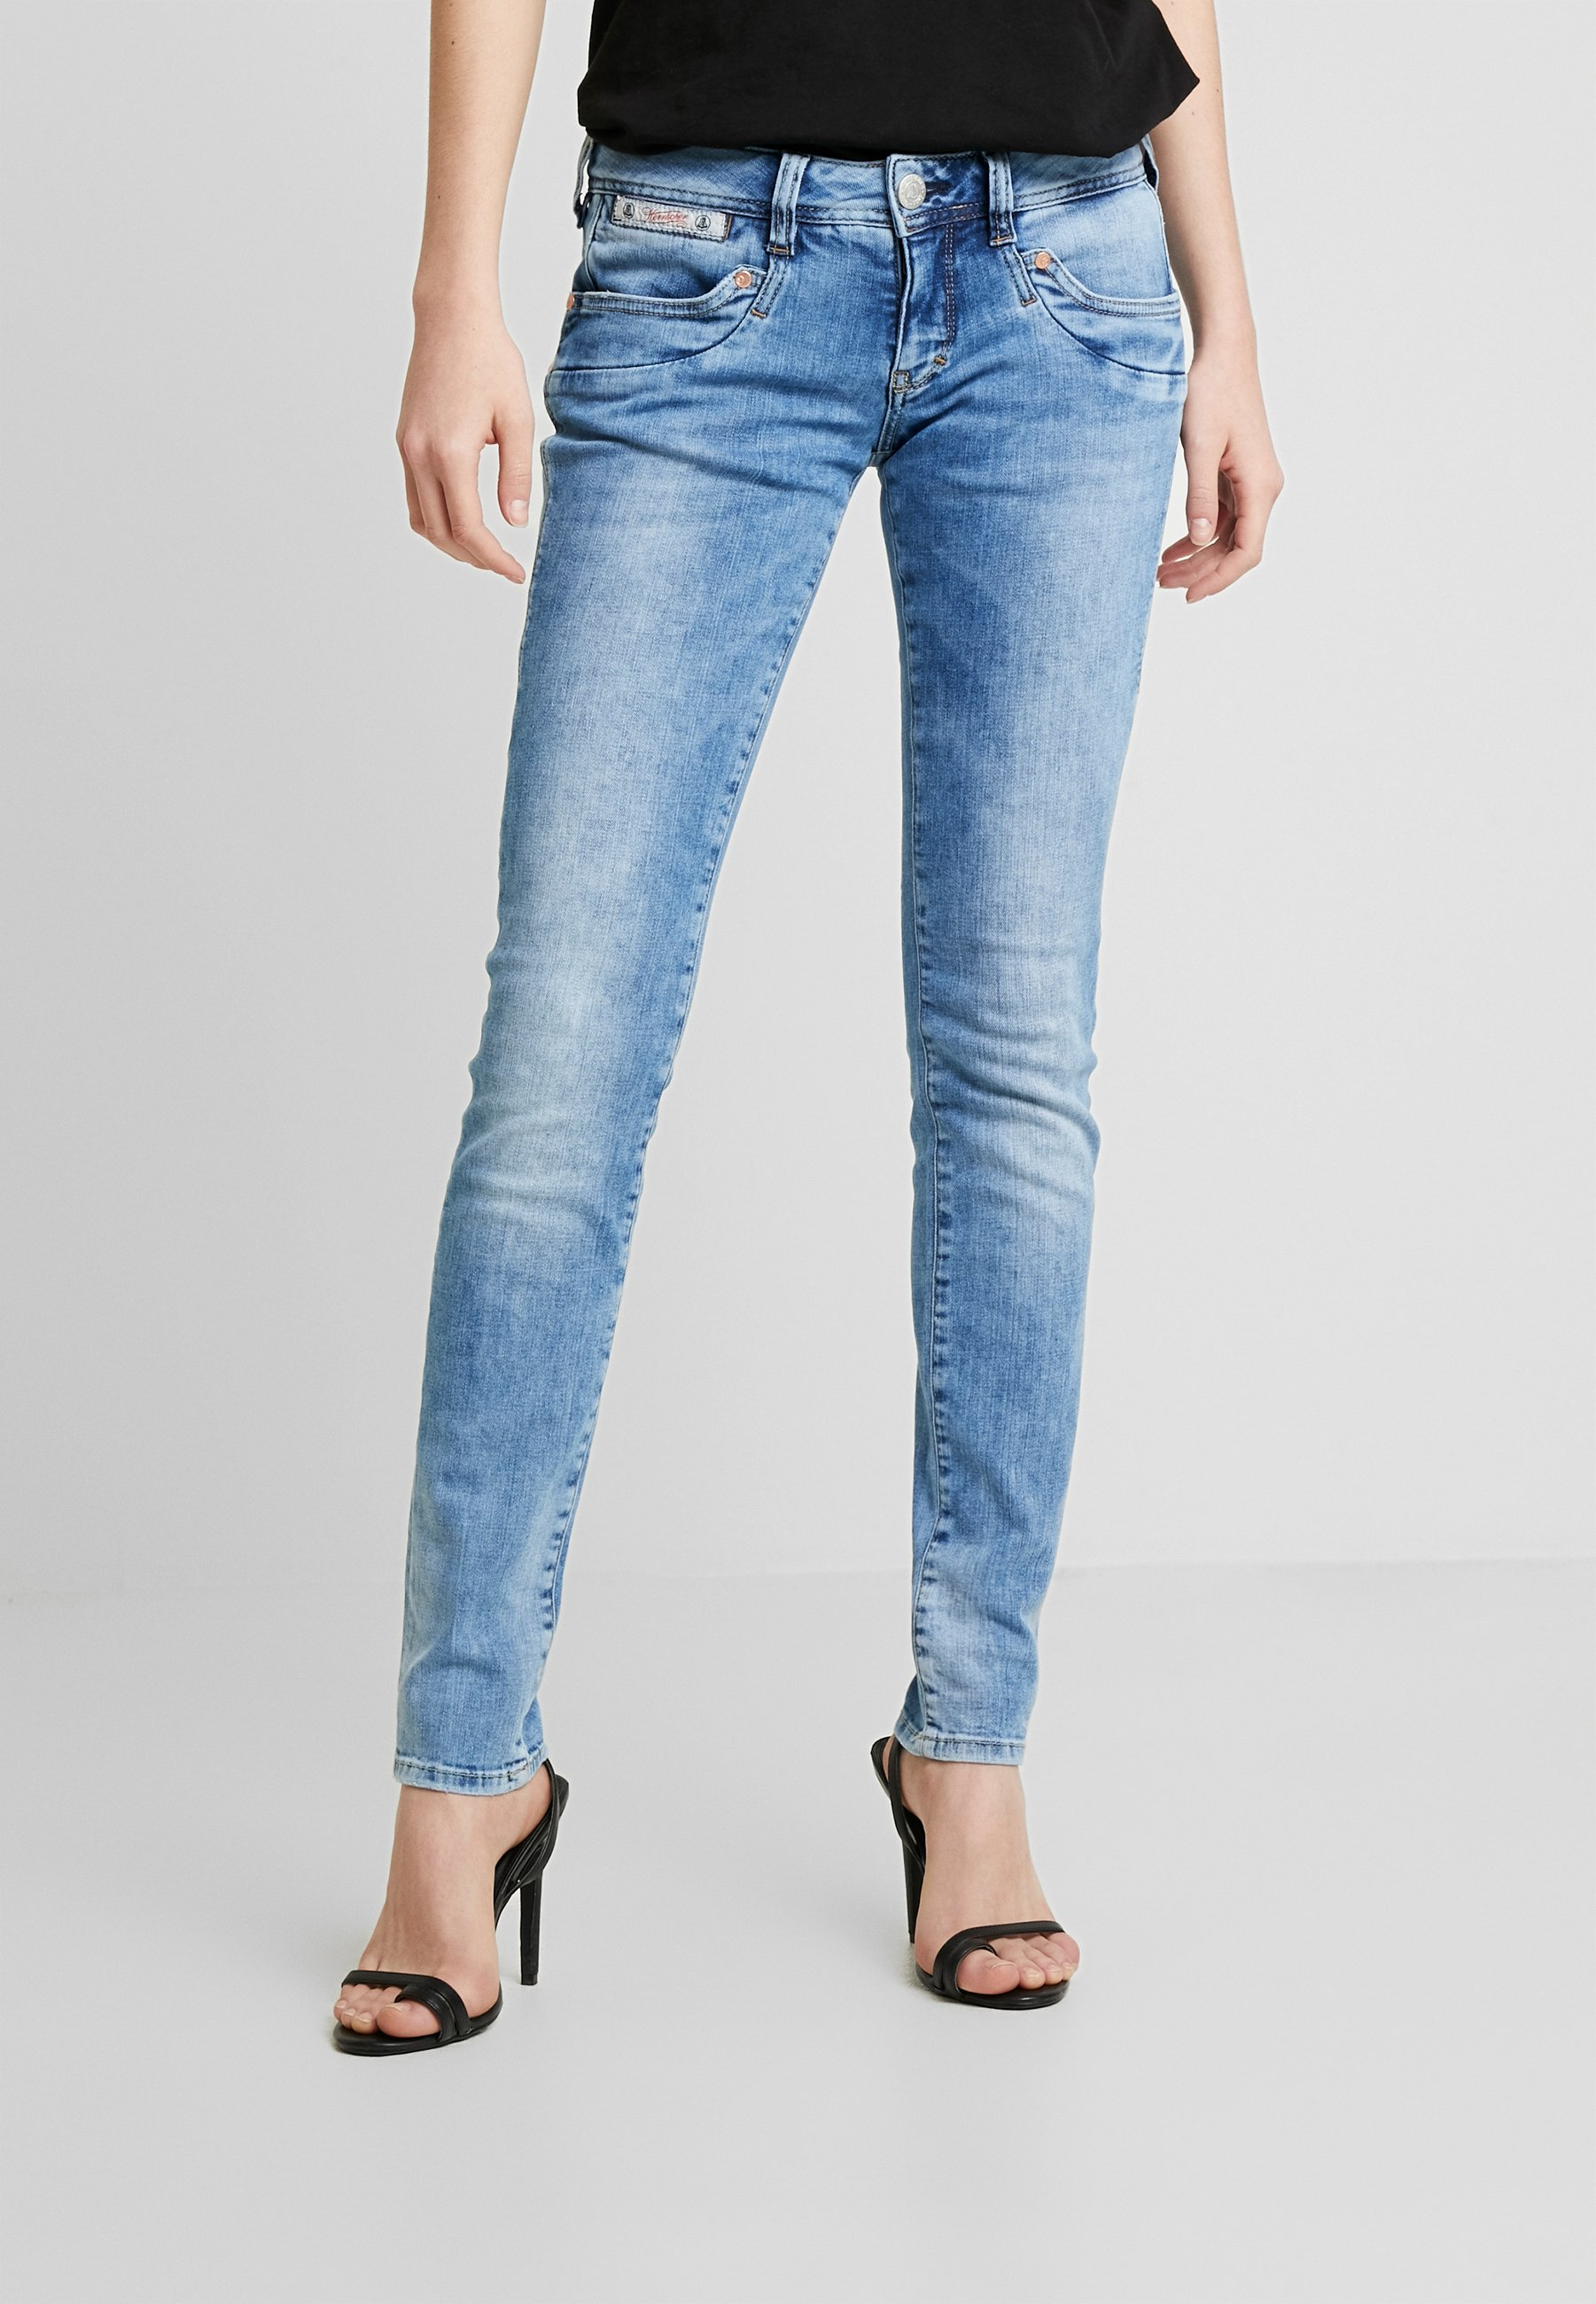 Herrlicher PIPER SLIM STRETCH - Jean slim - light blue denim - Jeans Femme YujAW